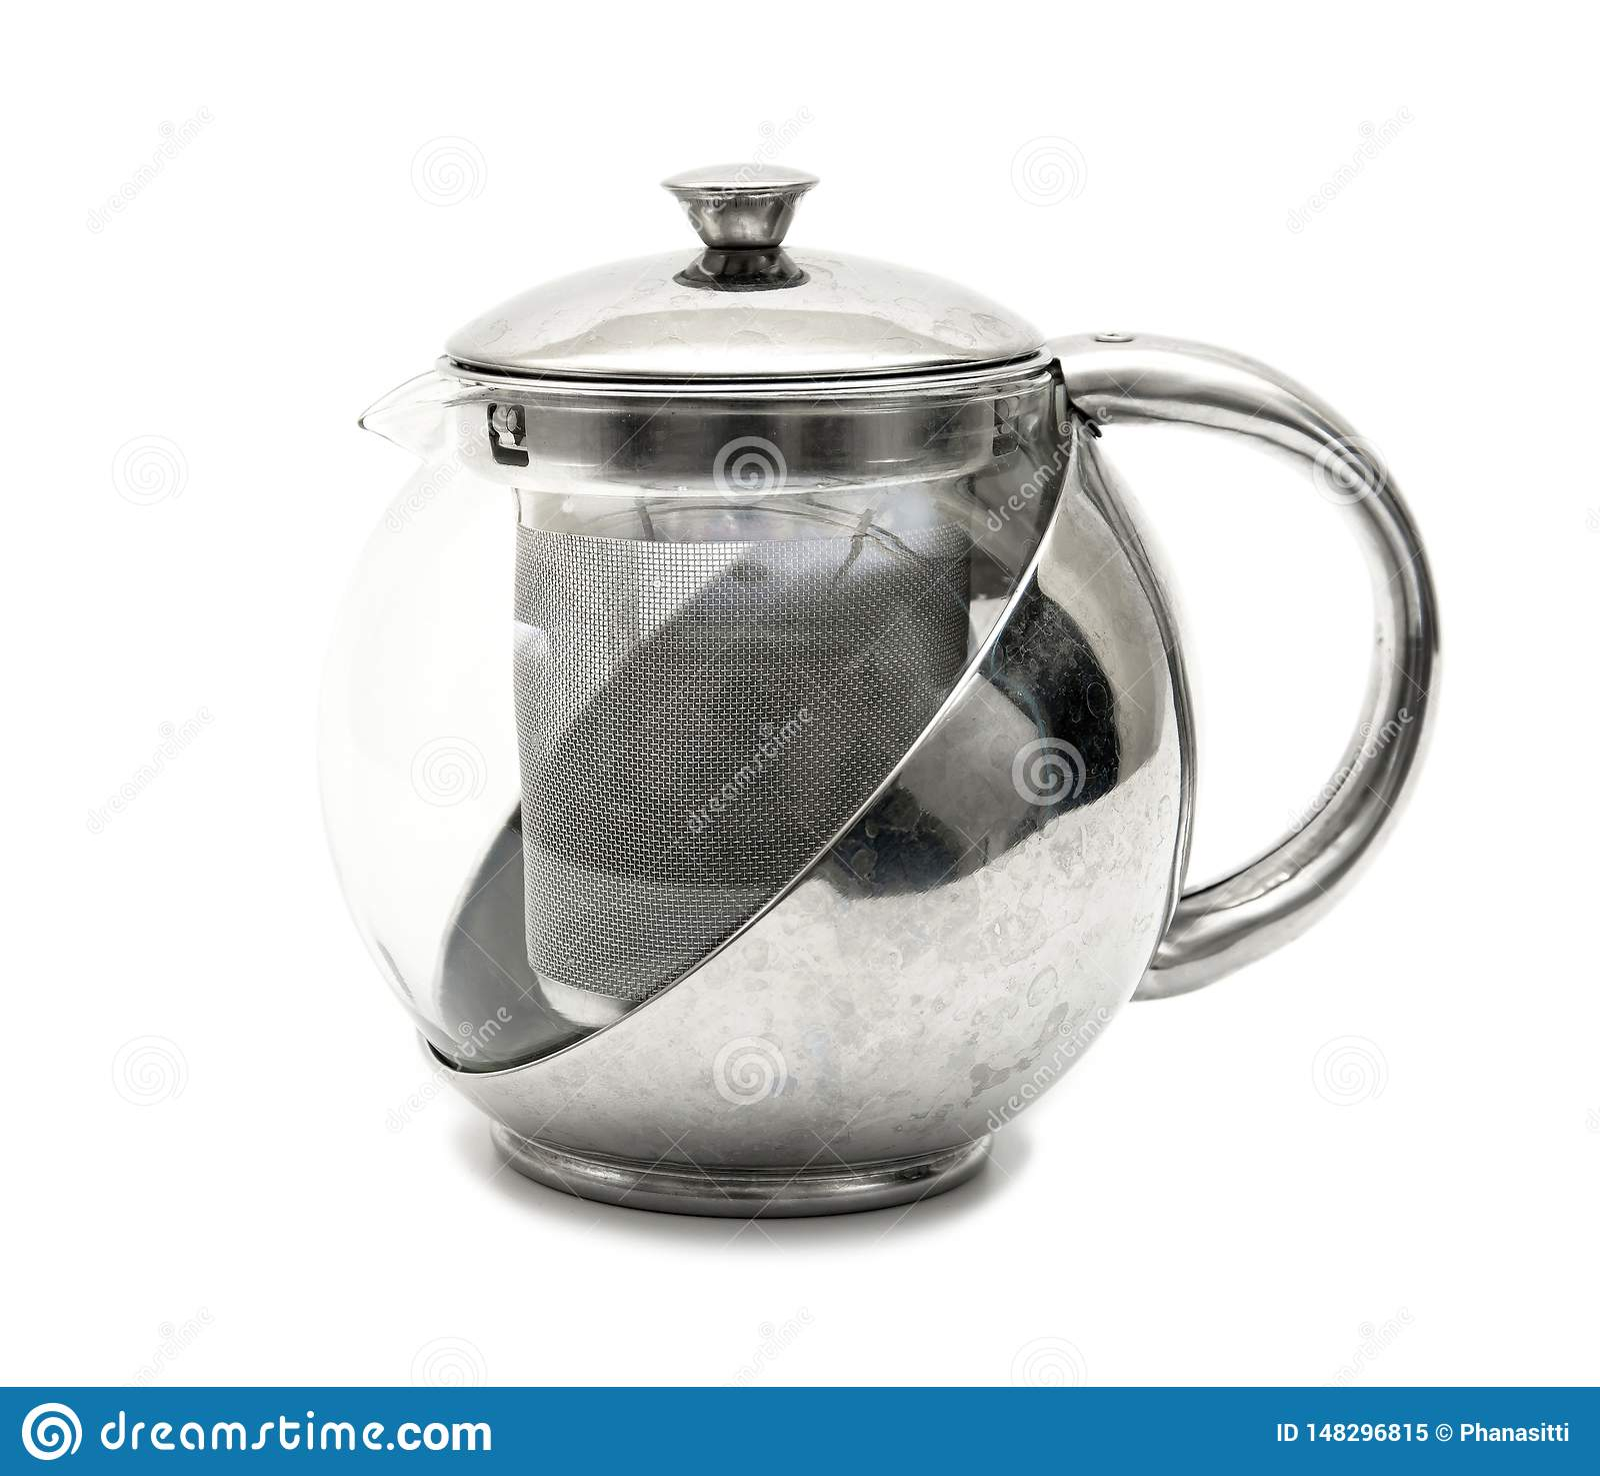 Kettle tea on white background. Modern stainless tea pot isolated